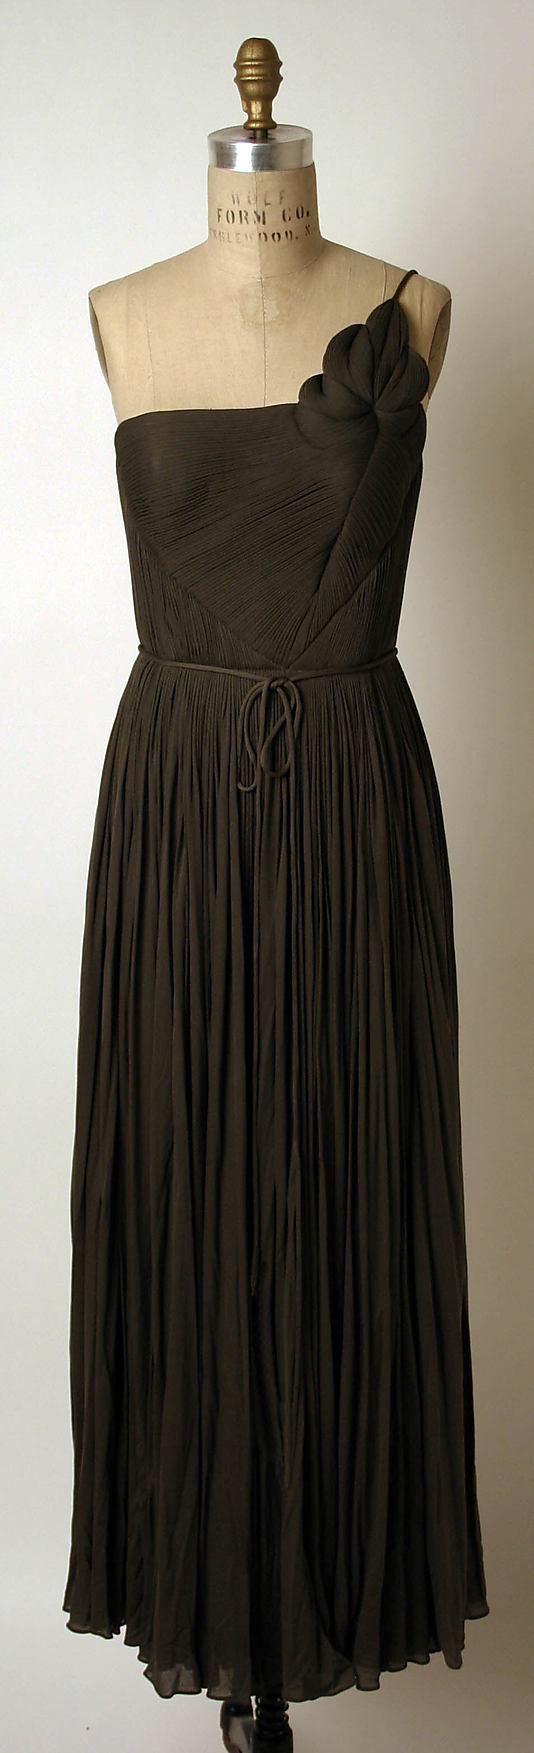 Ensemble, Madame Grès, 1960s, silk and nylon, Metropolitan Museum of Art